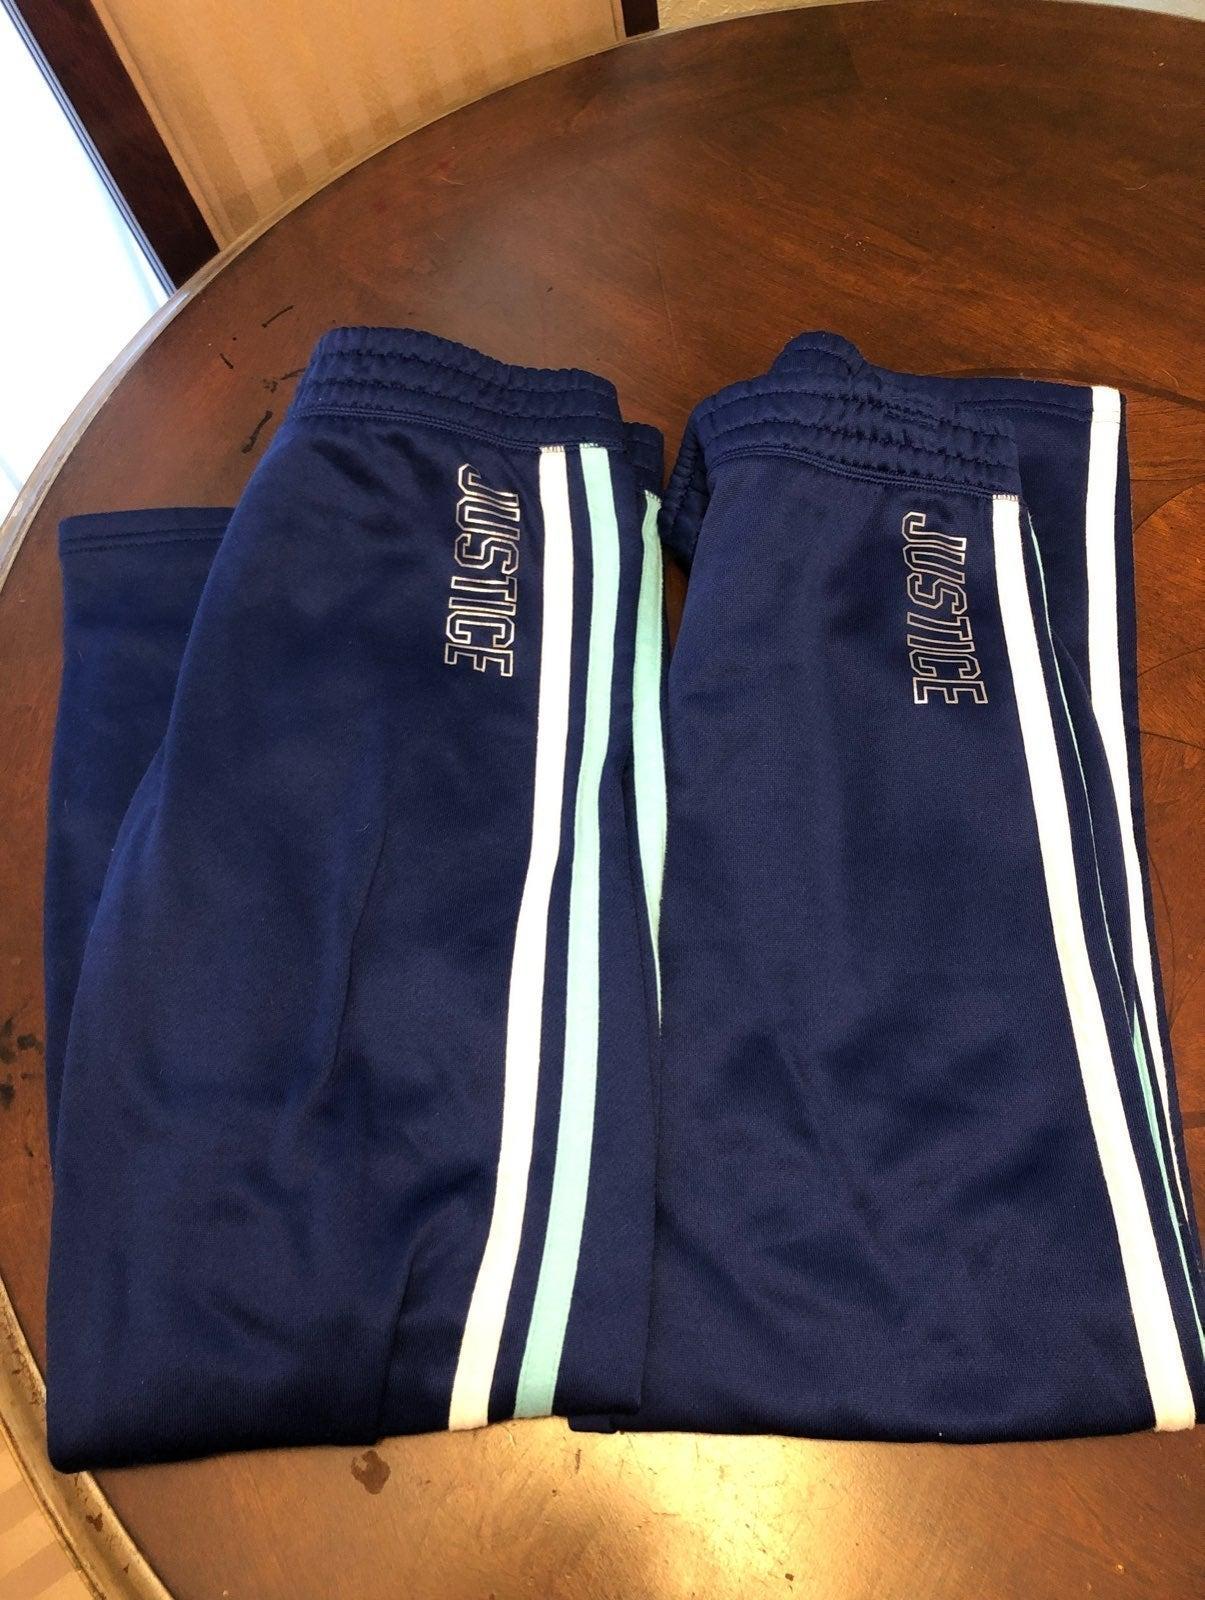 Jogging pants justice